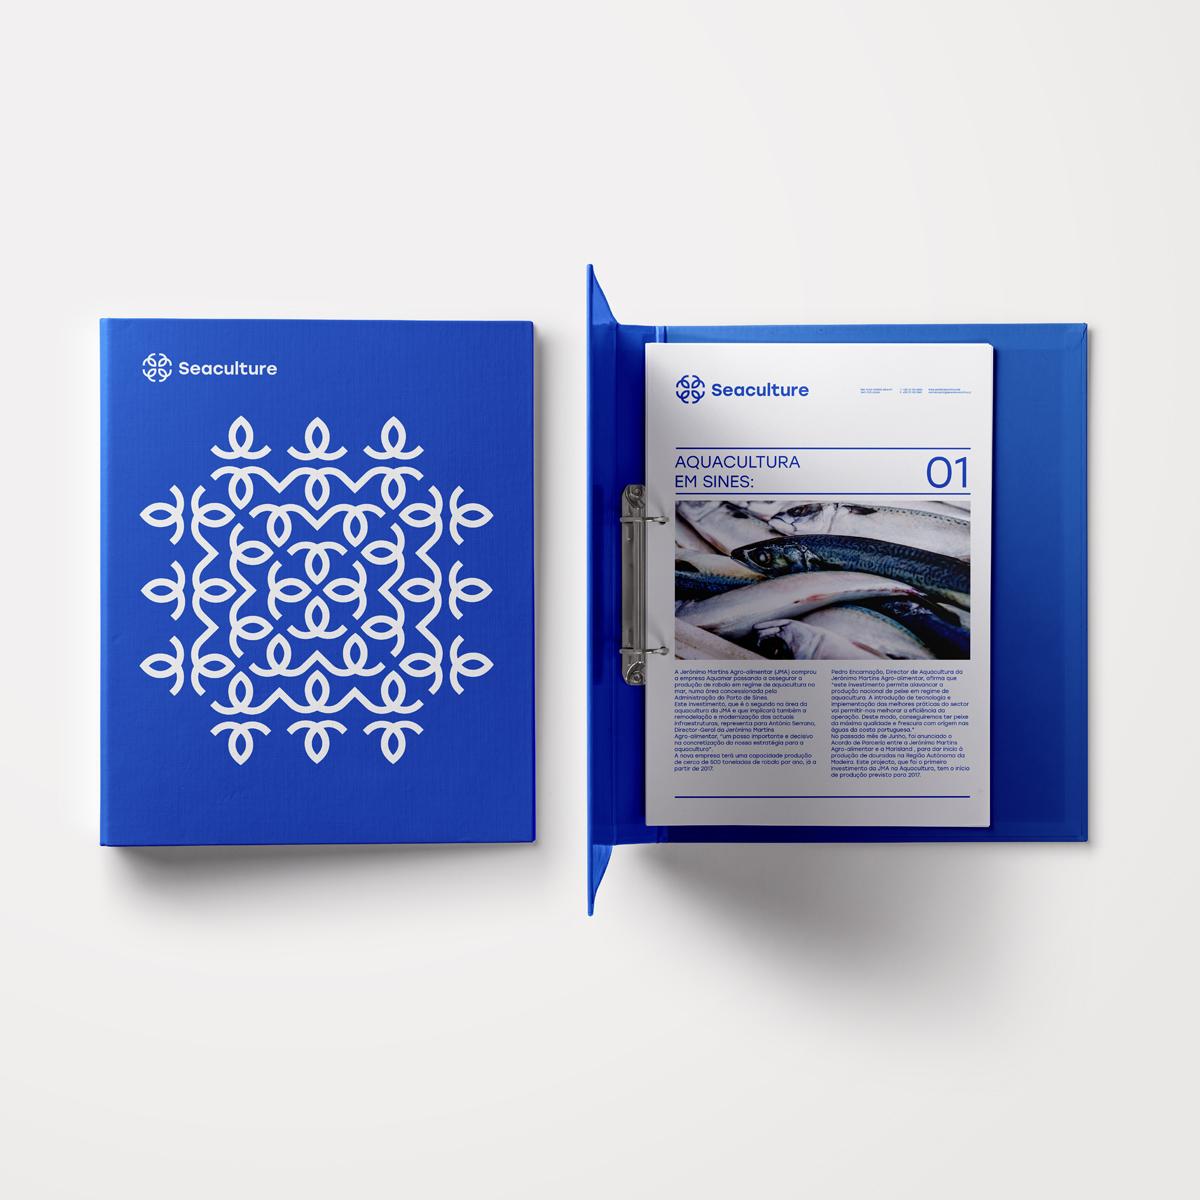 binder_Seaculture_UMA